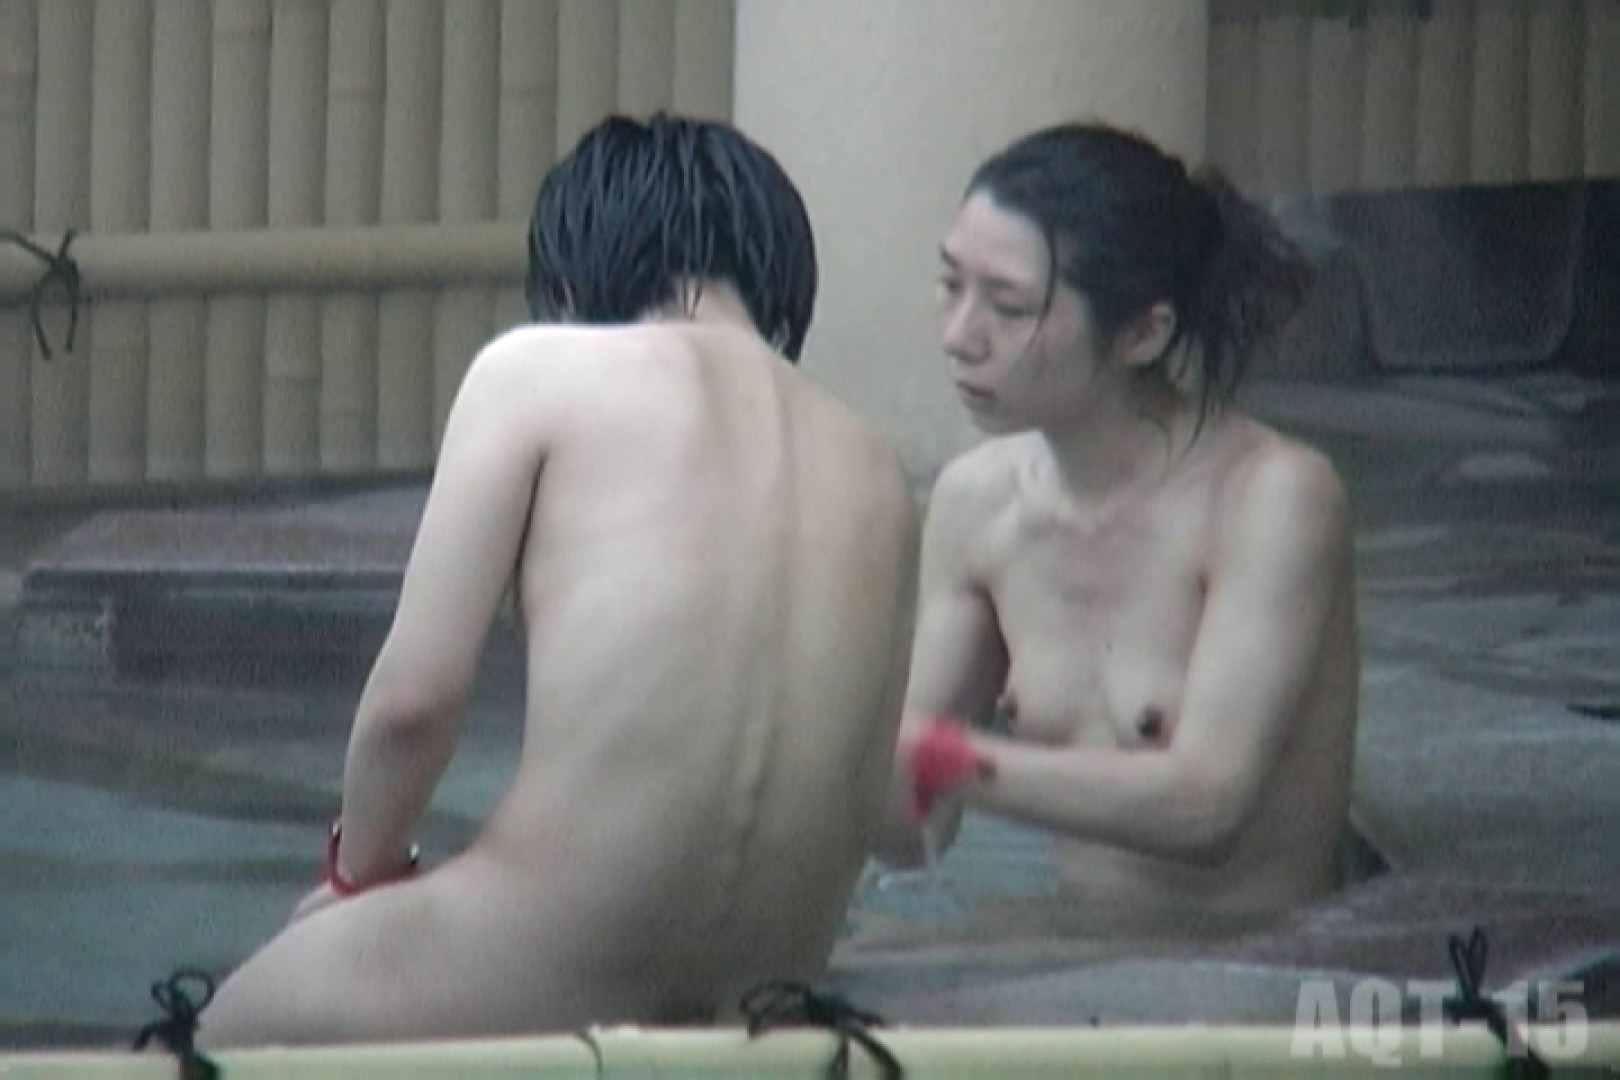 Aquaな露天風呂Vol.837 露天風呂突入 | 盗撮師作品  100pic 100